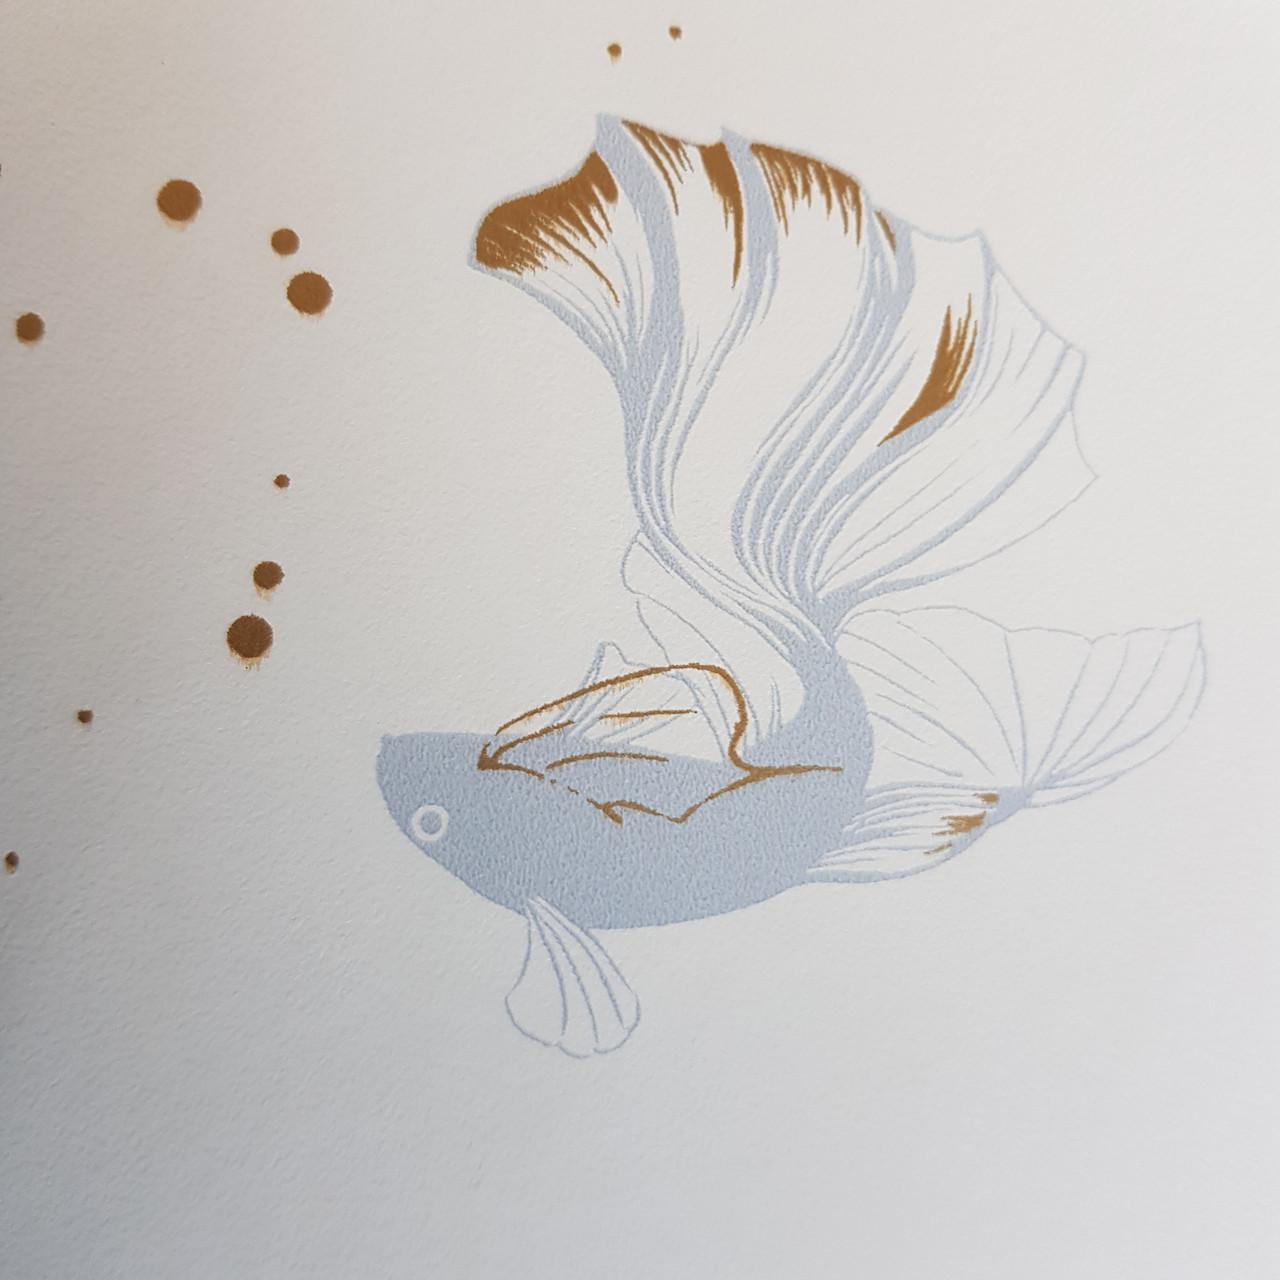 Обои виниловые на флизелине Caselio The Place to bed  0.53х10 м золотая рыбка голубая на белом фоне